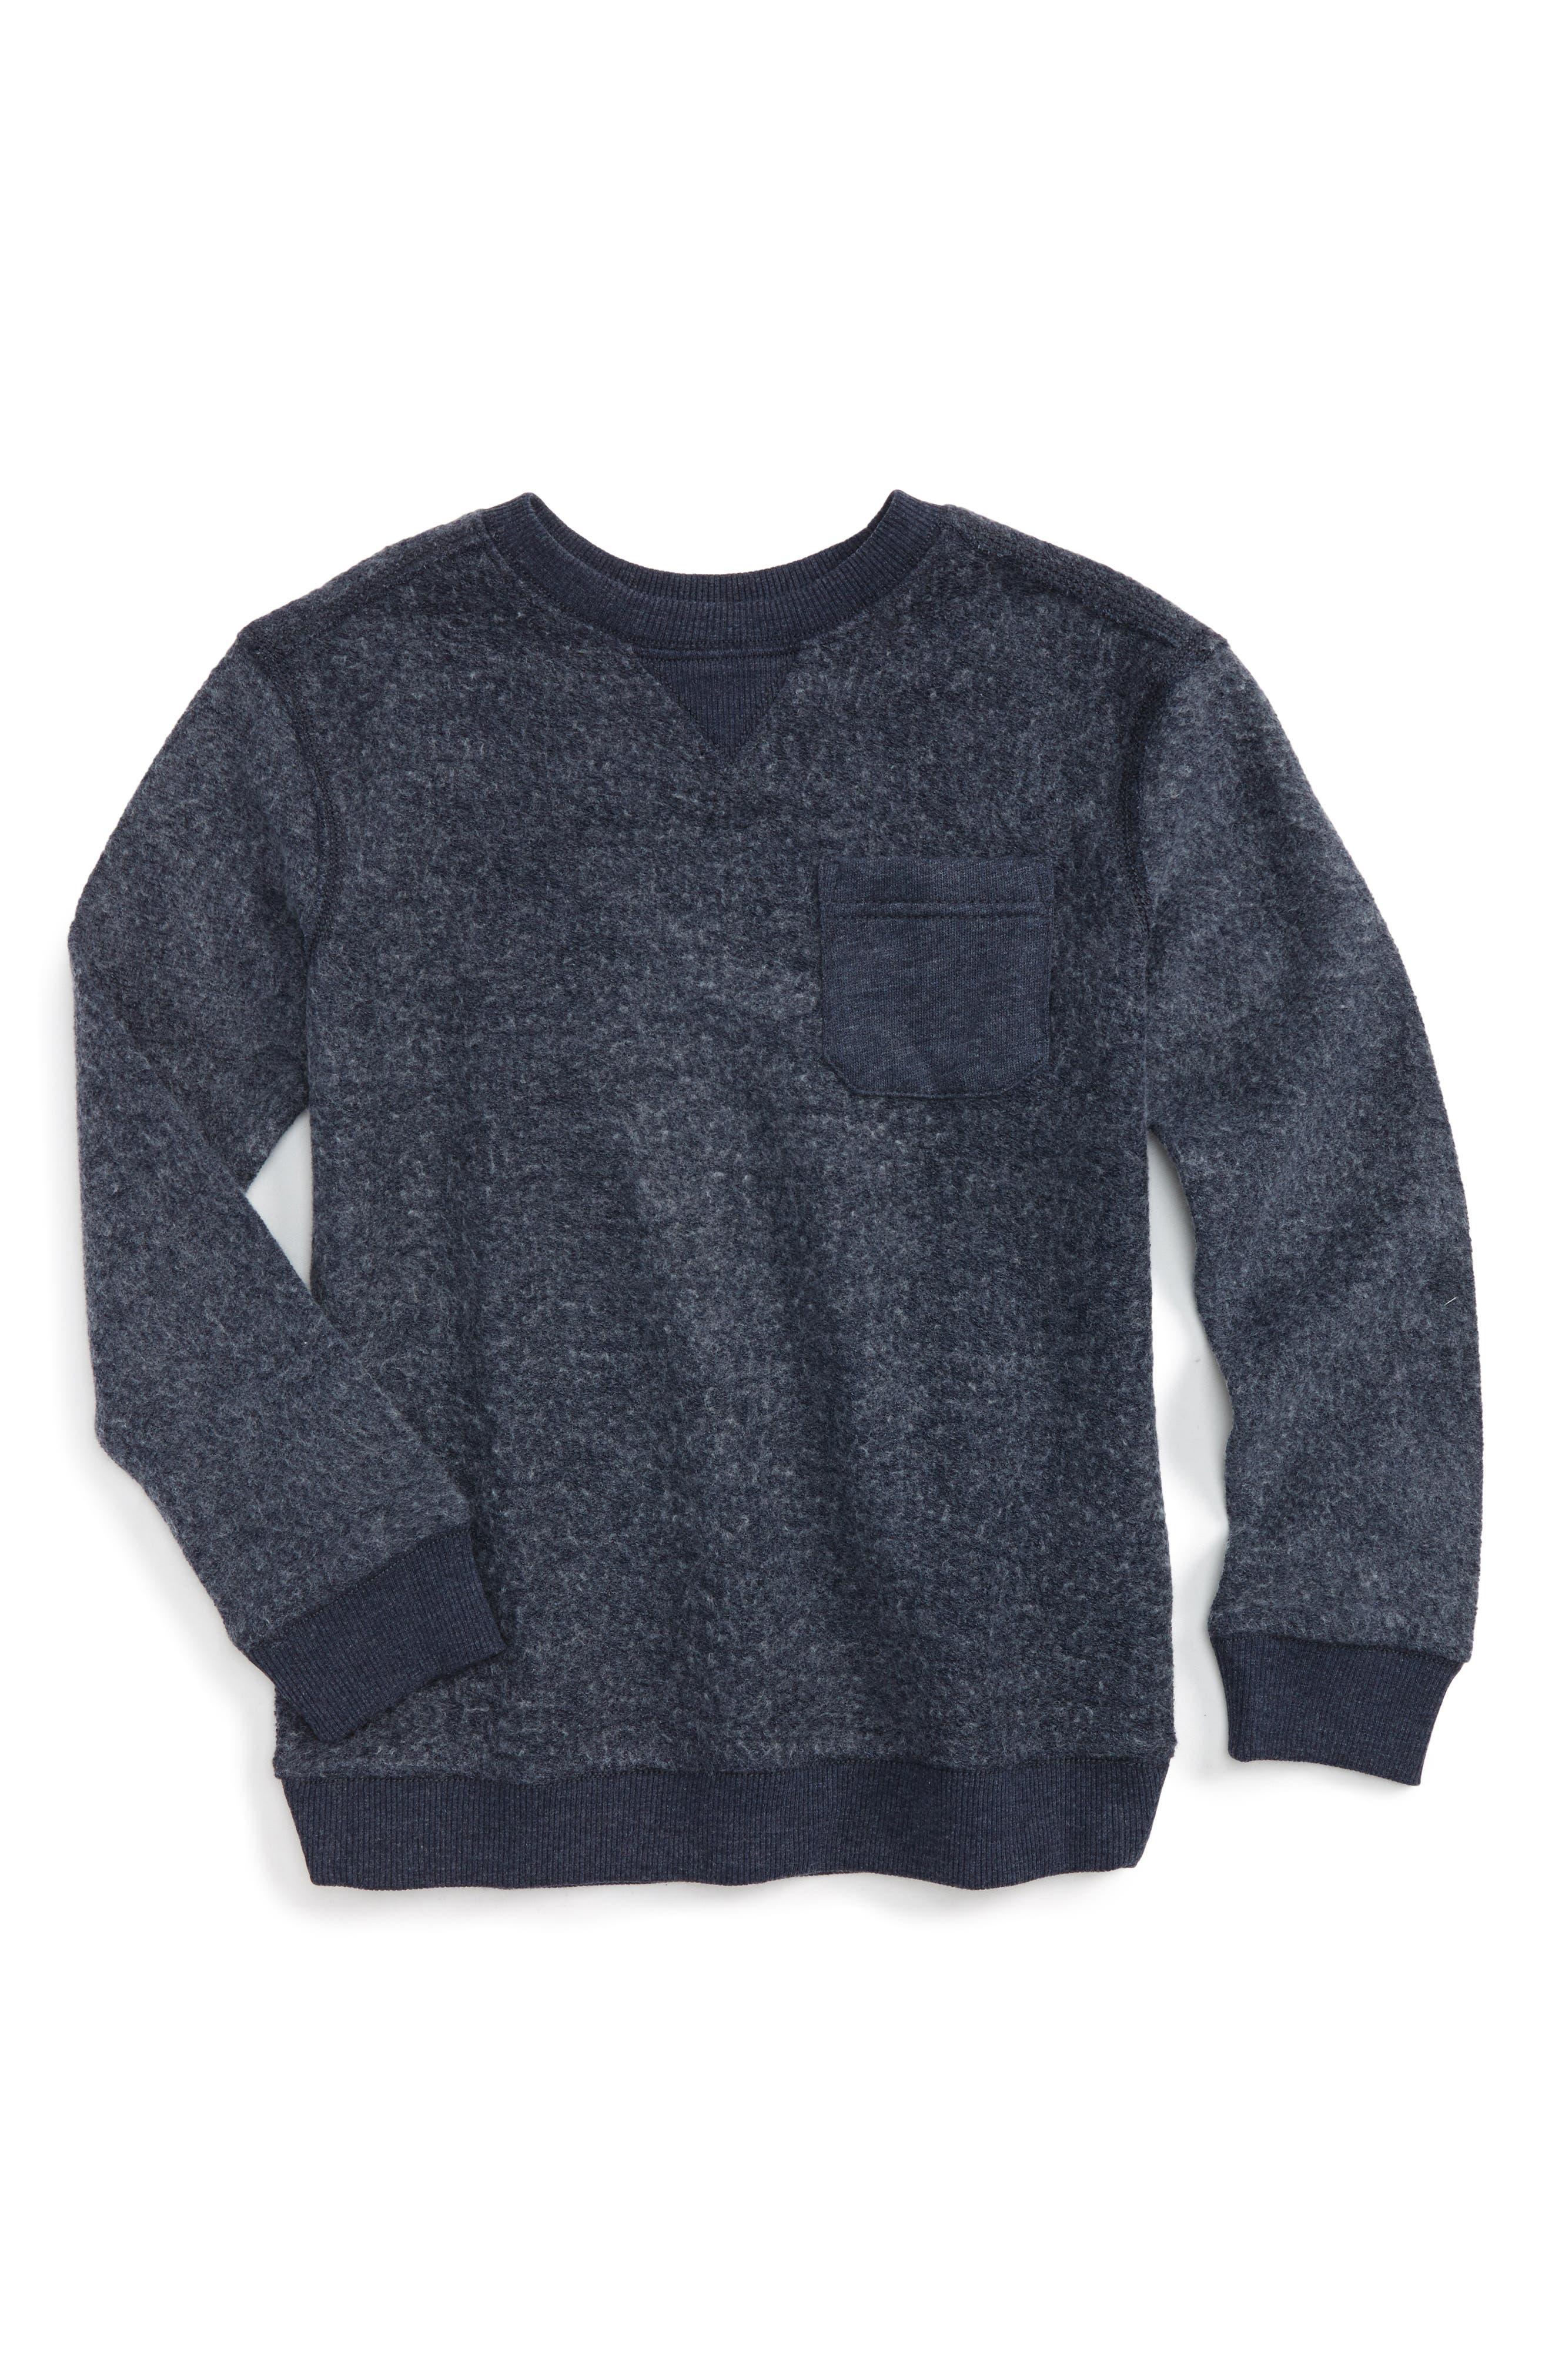 Alternate Image 1 Selected - Tucker + Tate Fleece Sweatshirt (Toddler Boys & Little Boys)